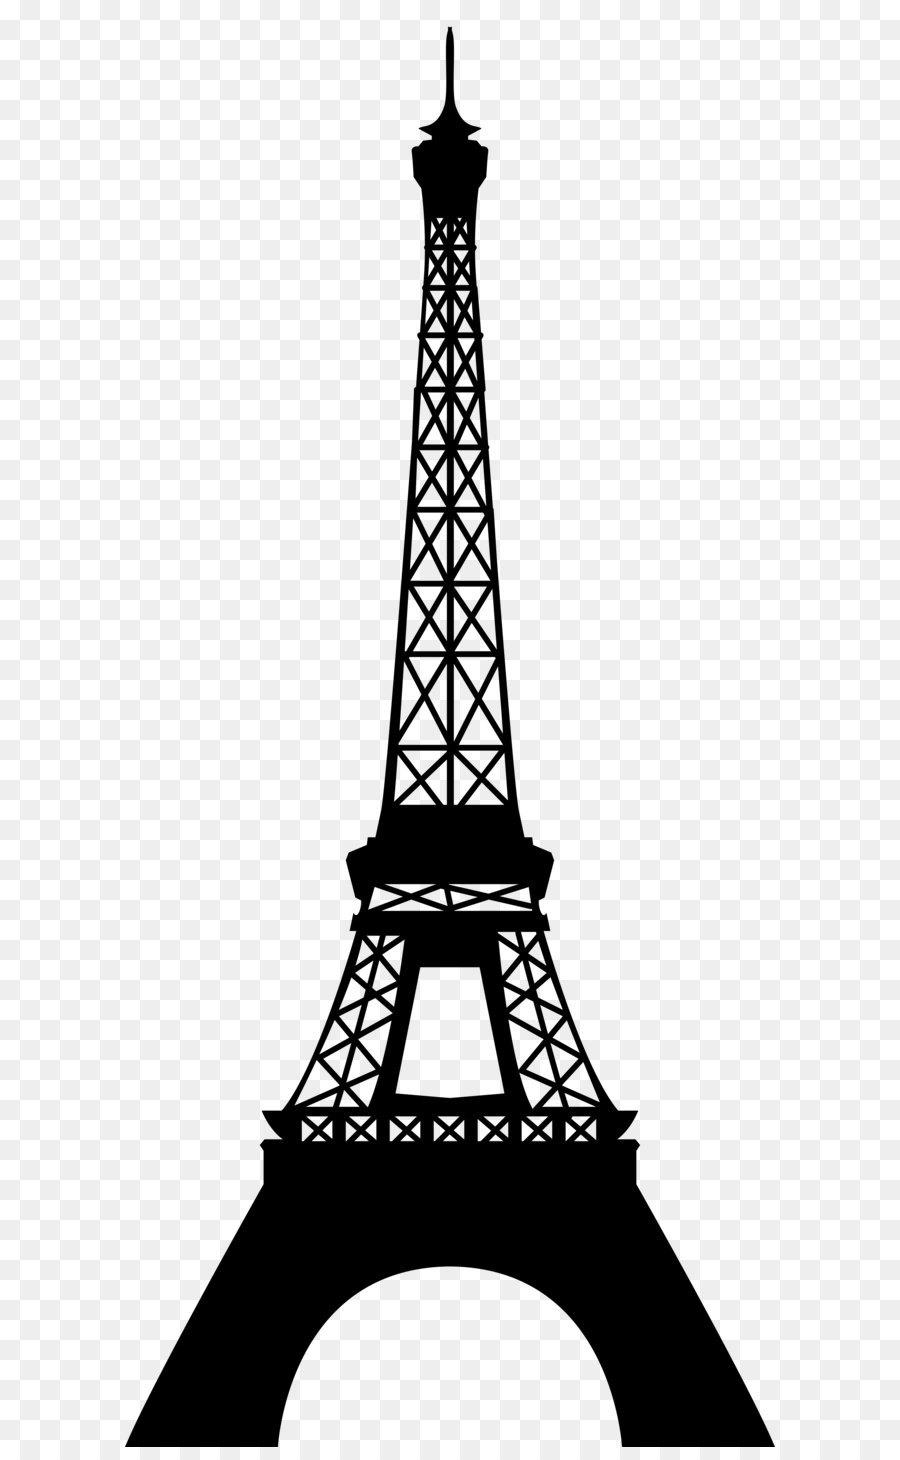 Eiffel Tower Clip art - Eiffel Tower Silhouette Transparent PNG Clip Art  Image